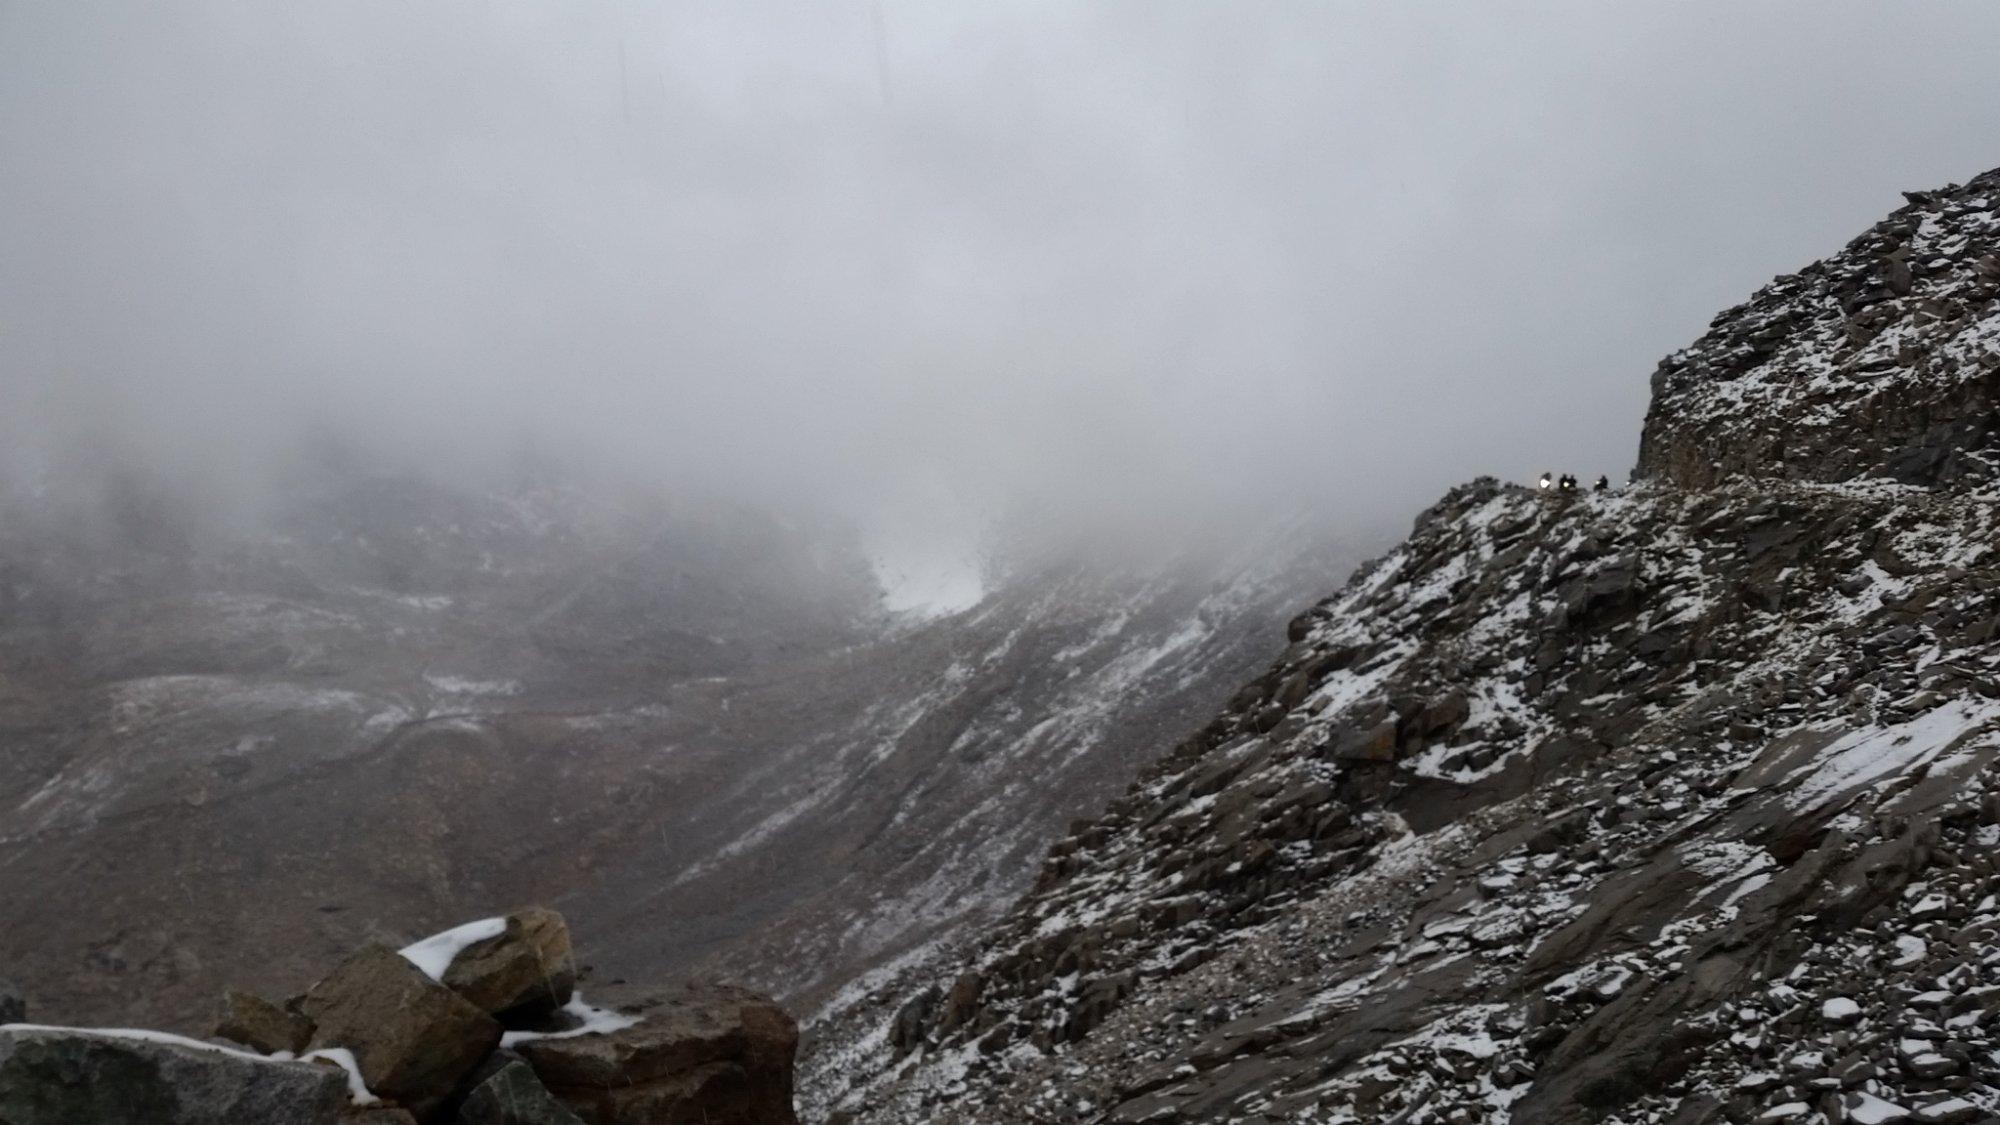 2018-09-08 Riding to Khardungla Pass again 04.jpg